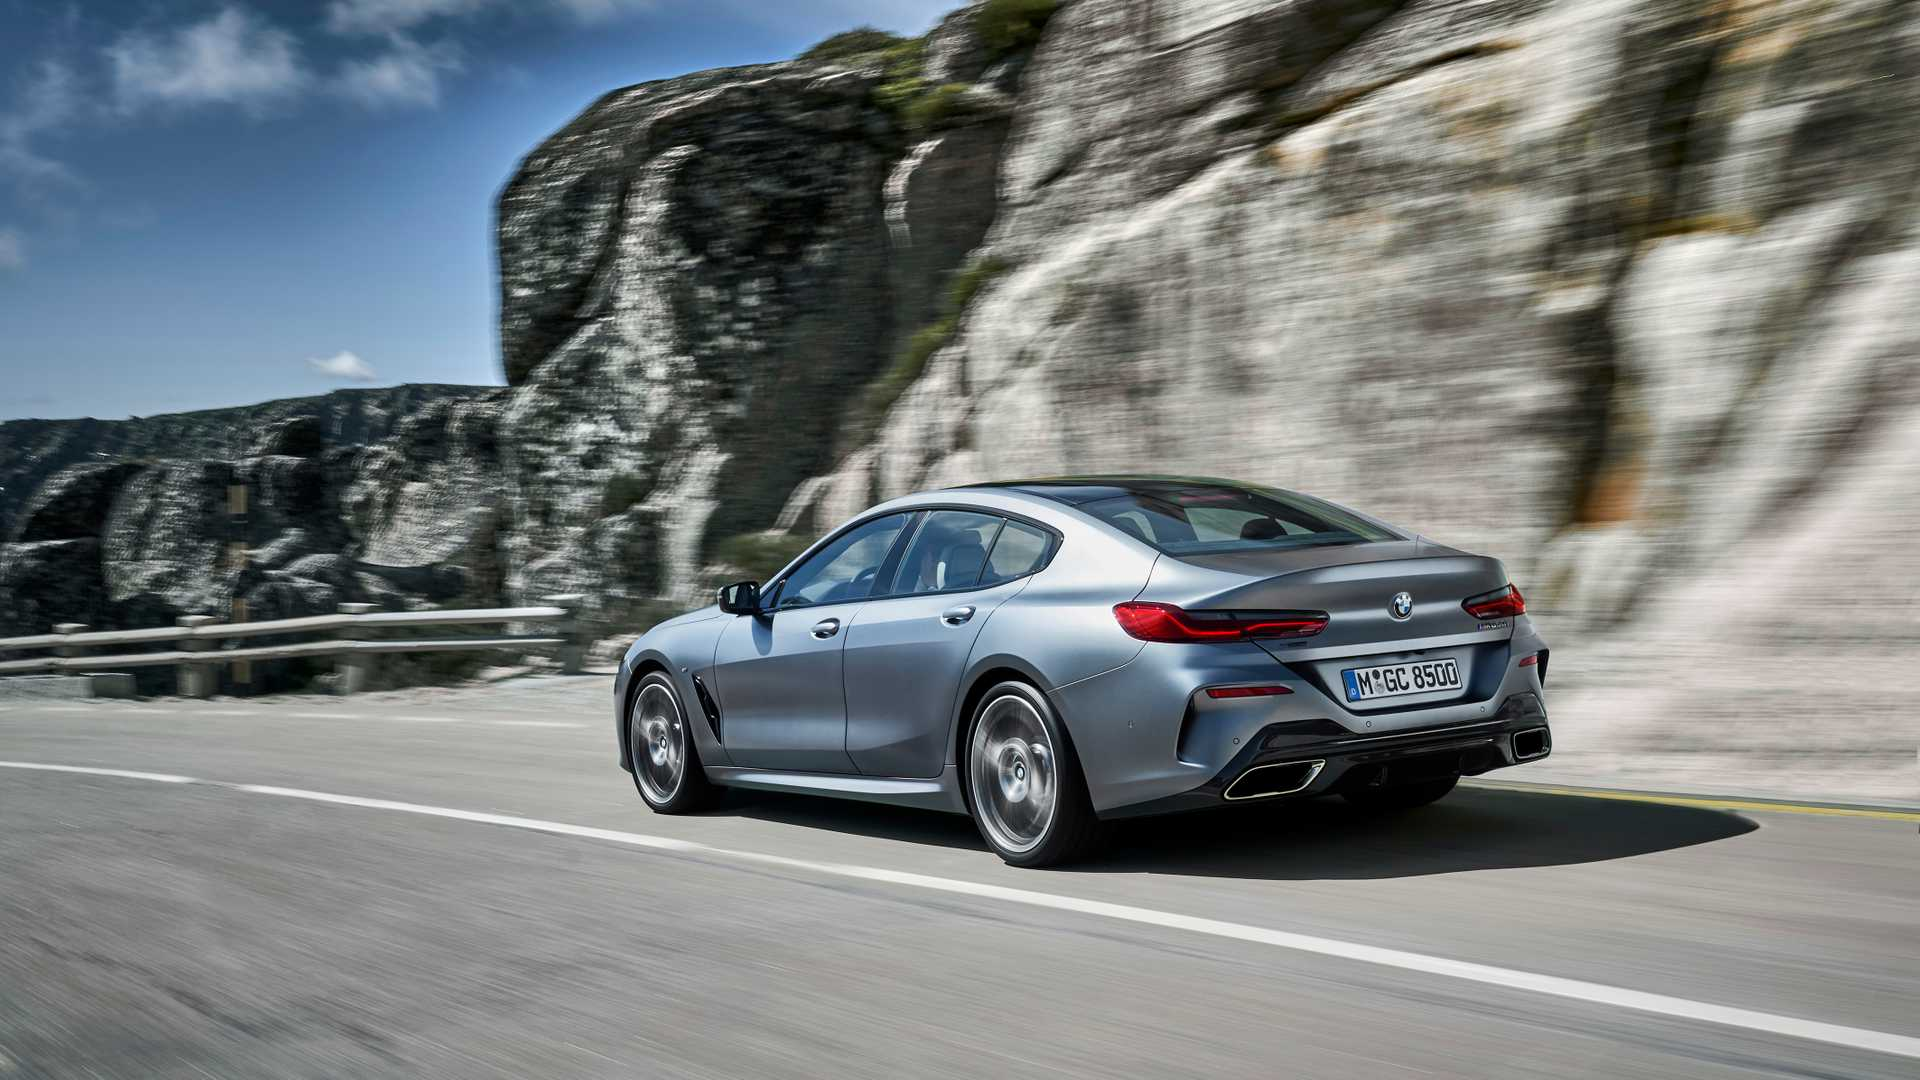 bmw-serie-8-gran-coupe-2020 (6)